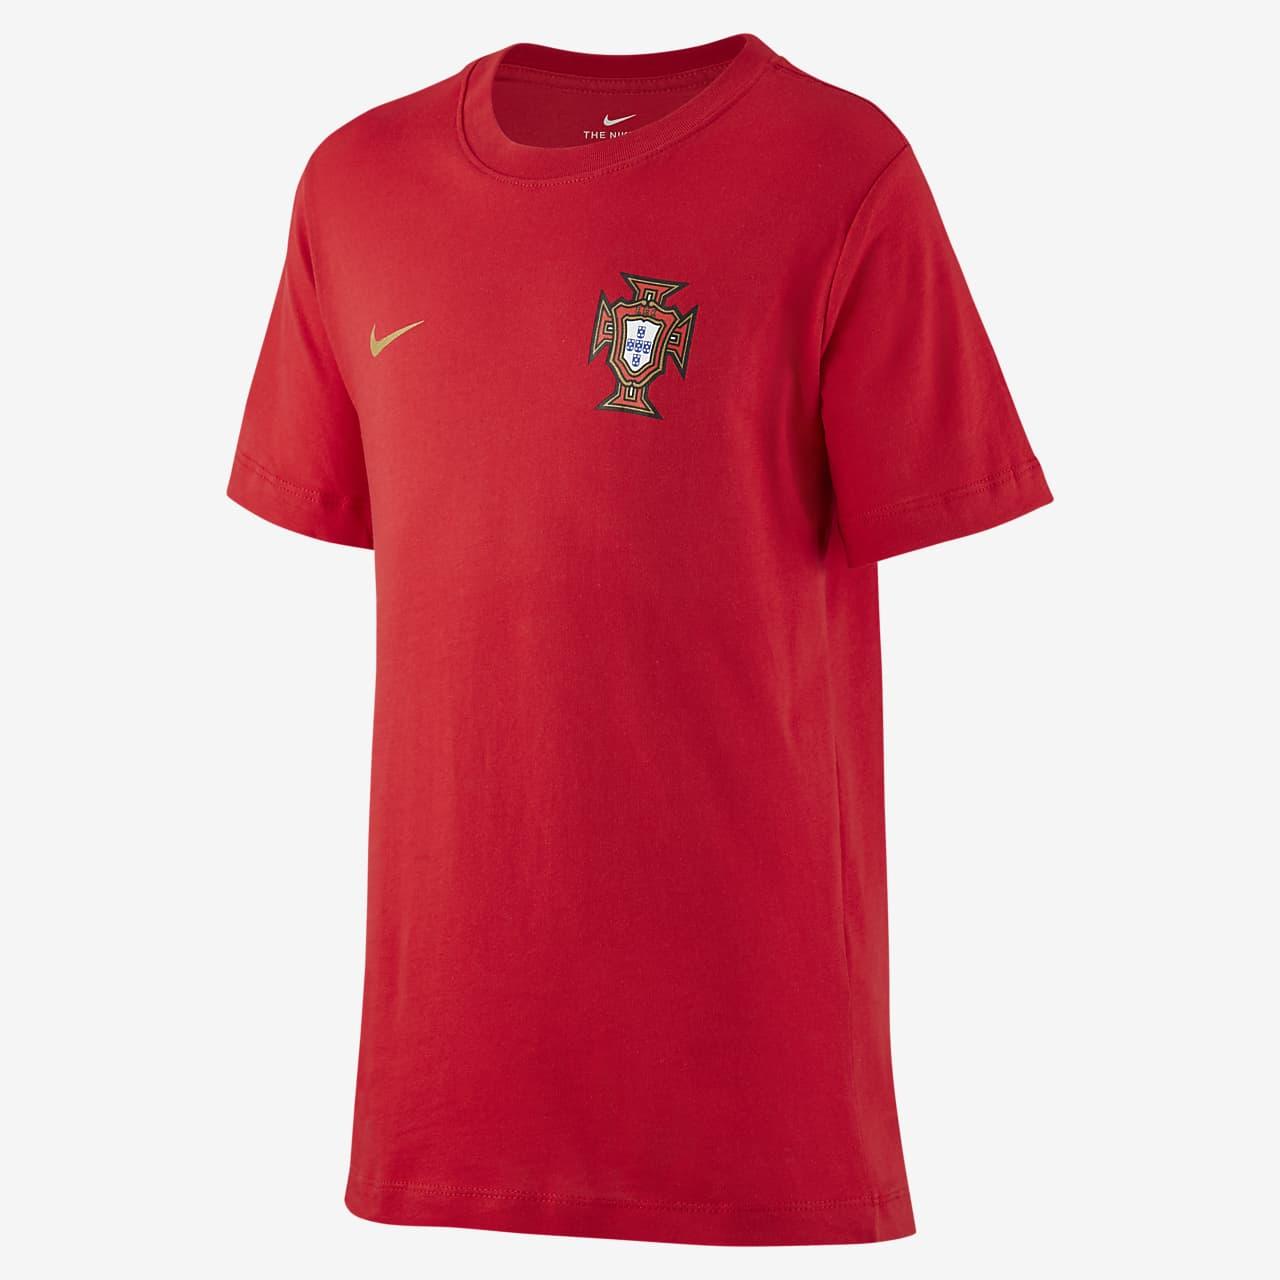 Portugal Older Kids' Football T-Shirt